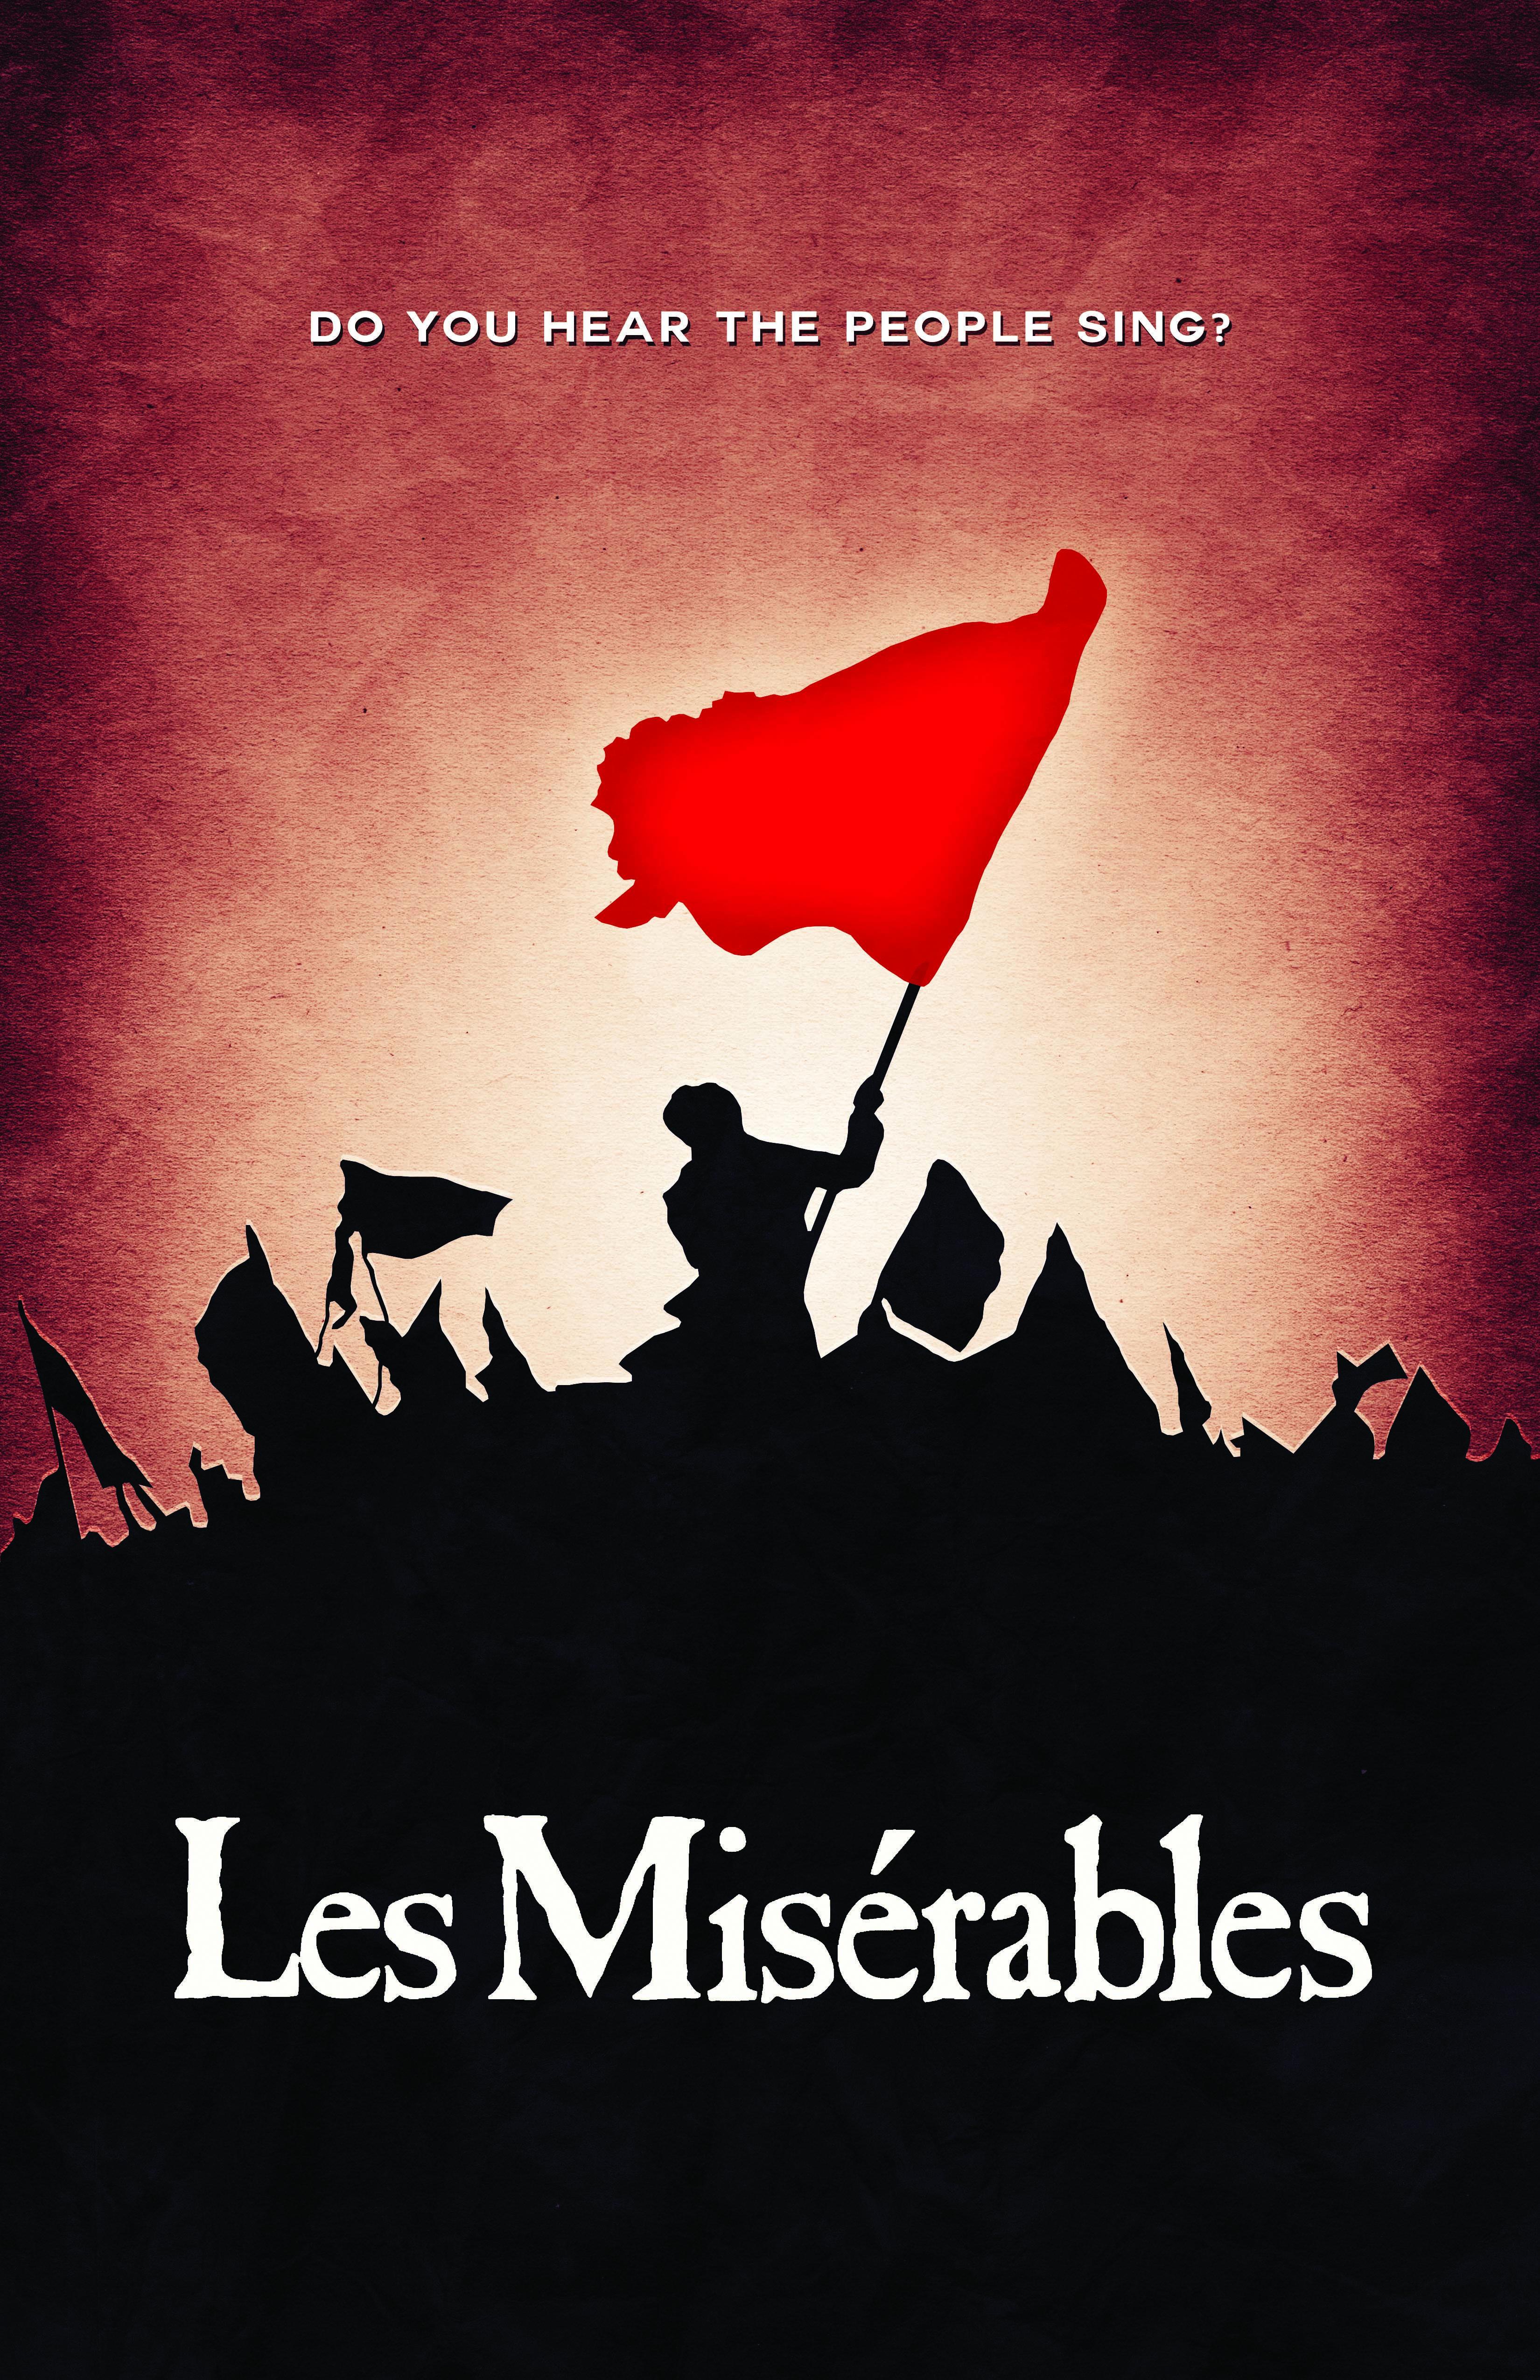 Les Miserables Movie Poster